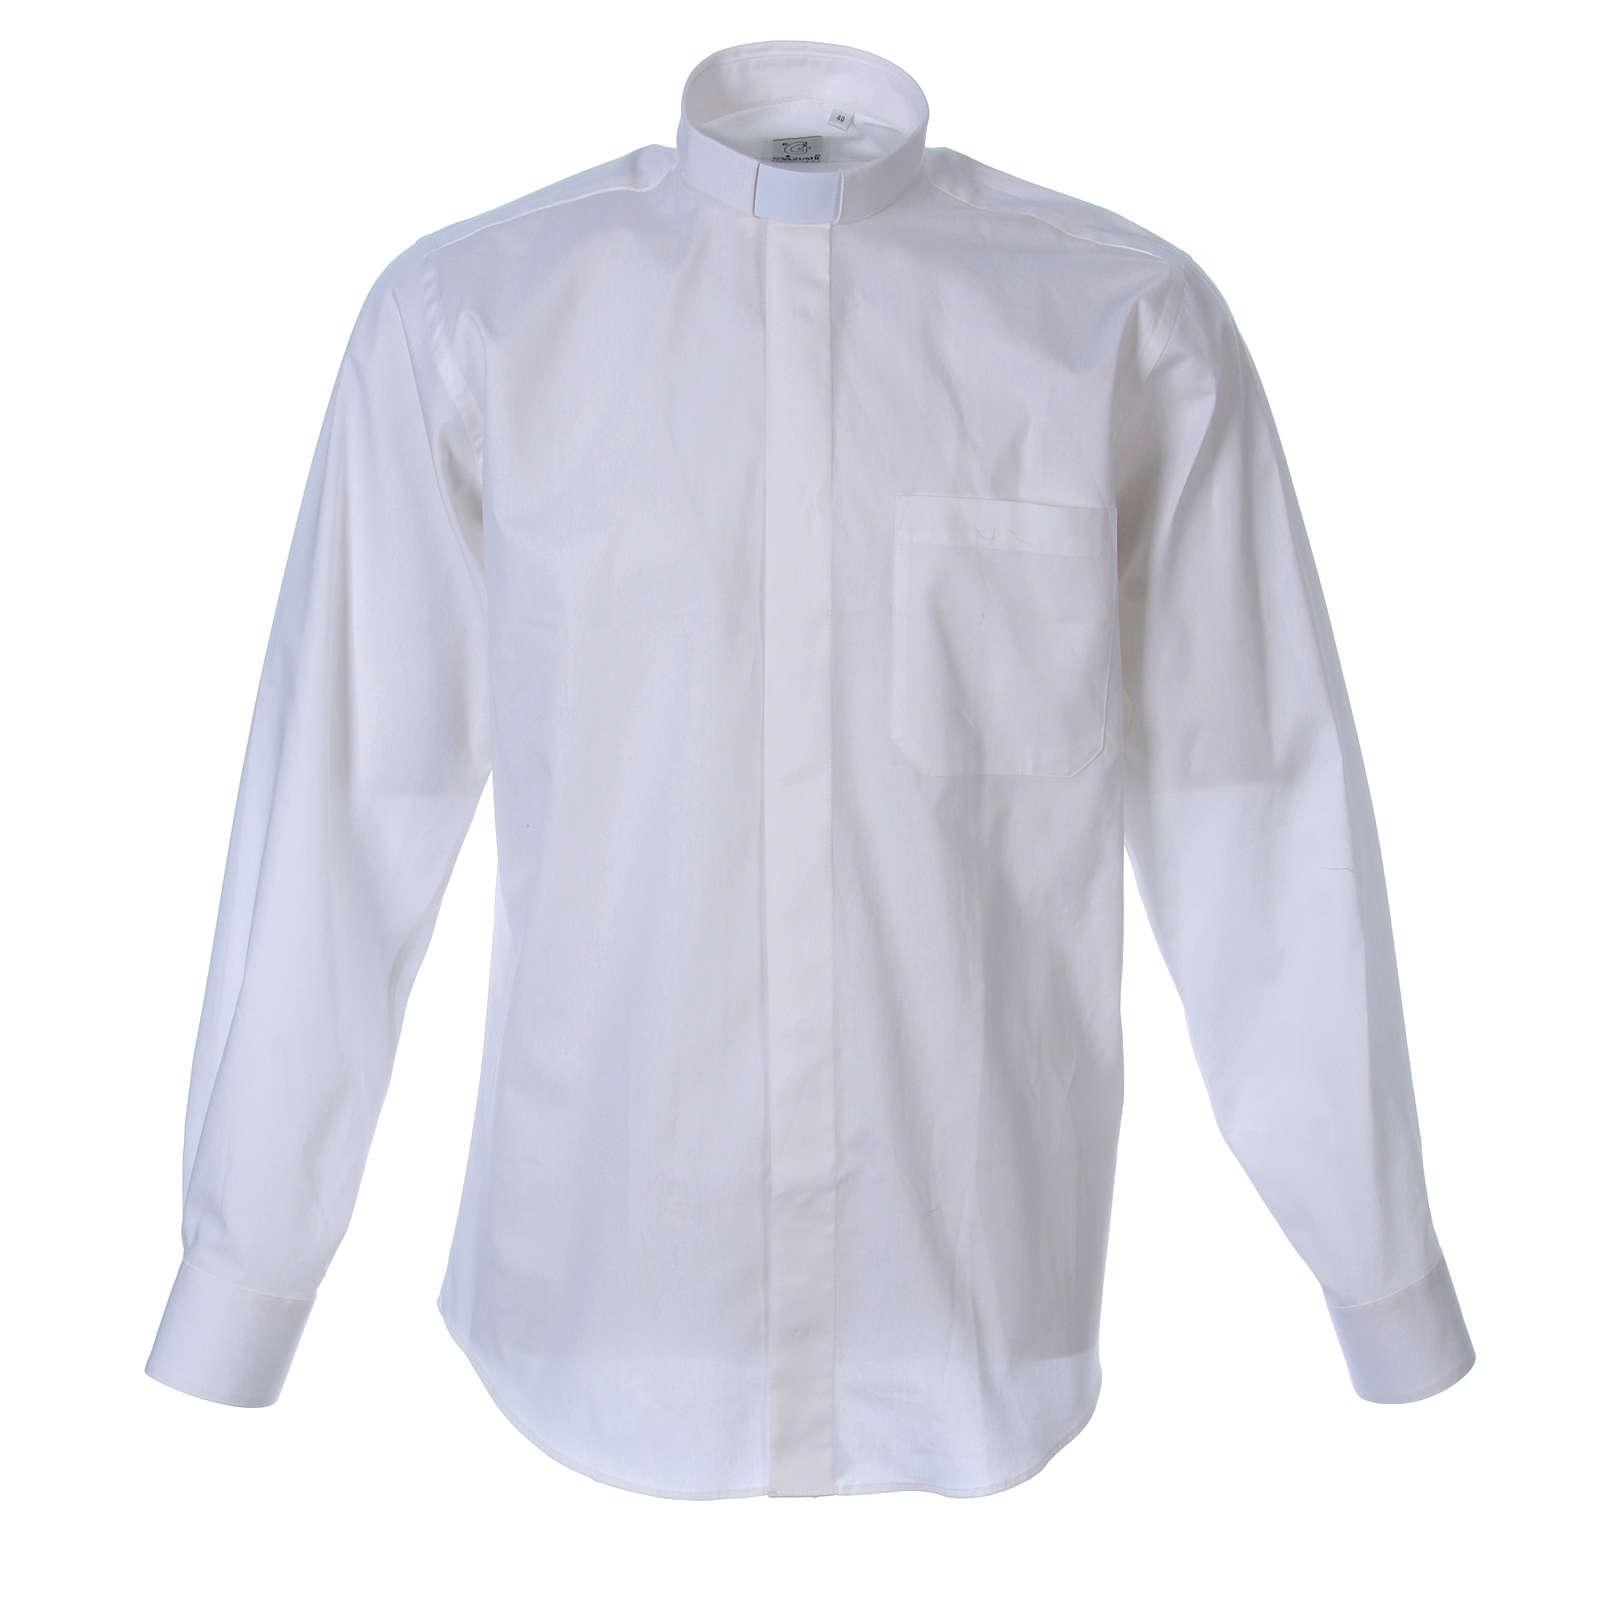 STOCK Camicia clergy manica lunga popeline bianca 4